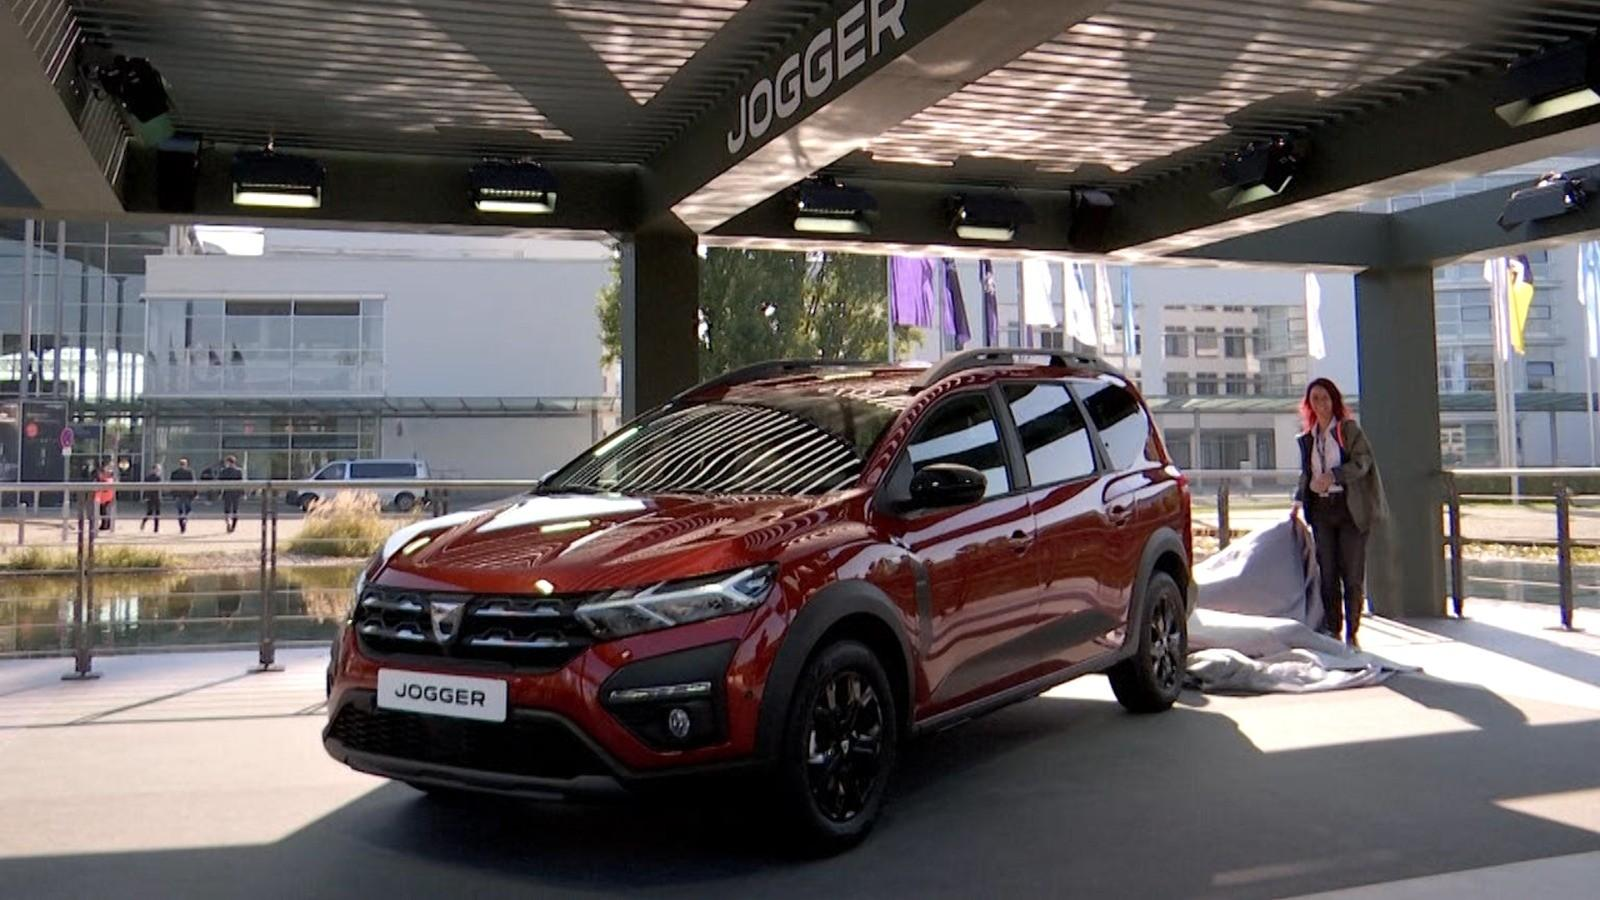 Dacia Jogger s-a lansat oficial la Salonul Auto de la Muchen